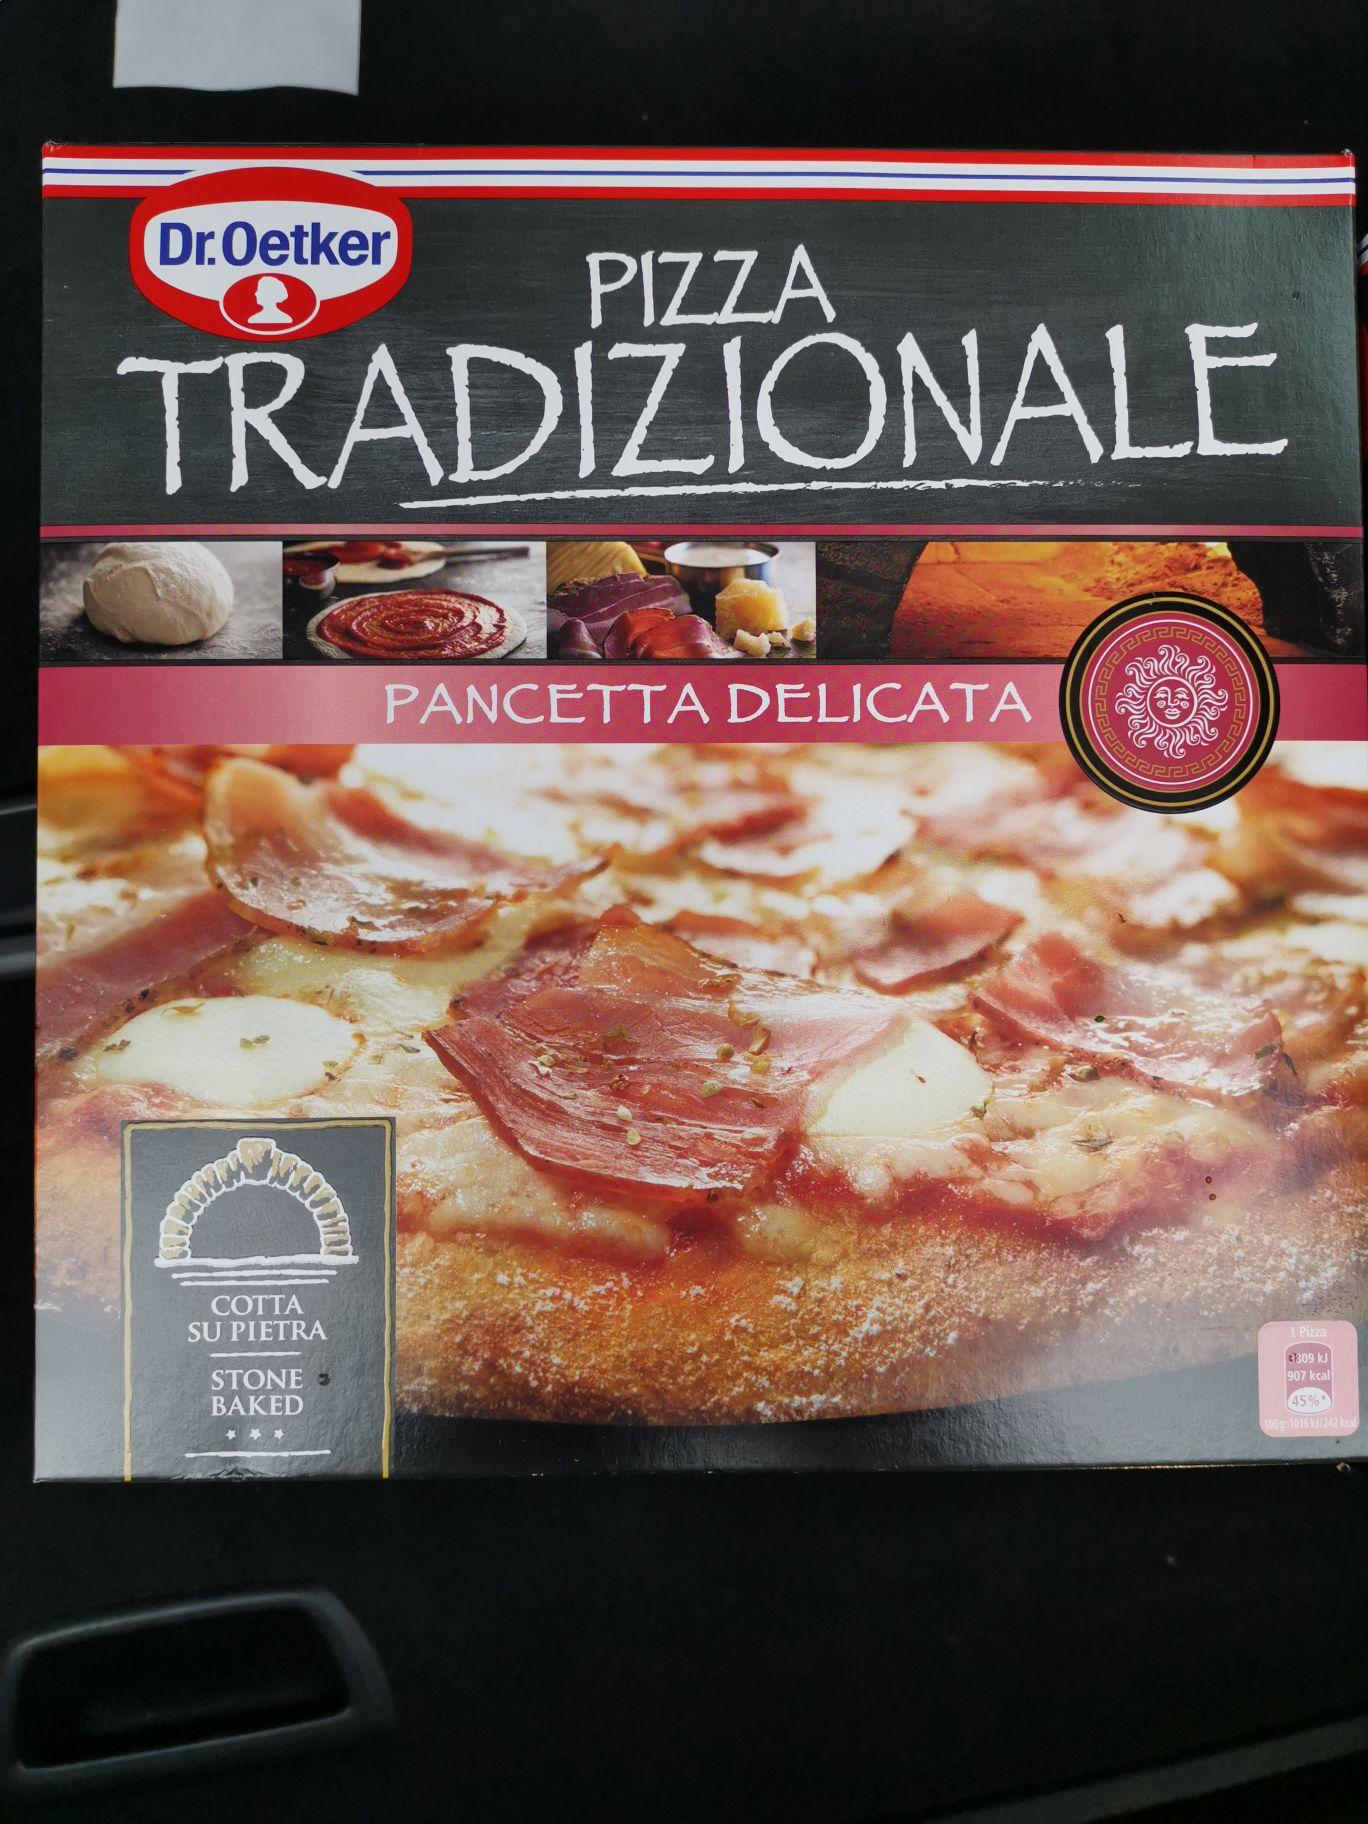 Edeka - Dr. Oetker Pizza Tradizionale